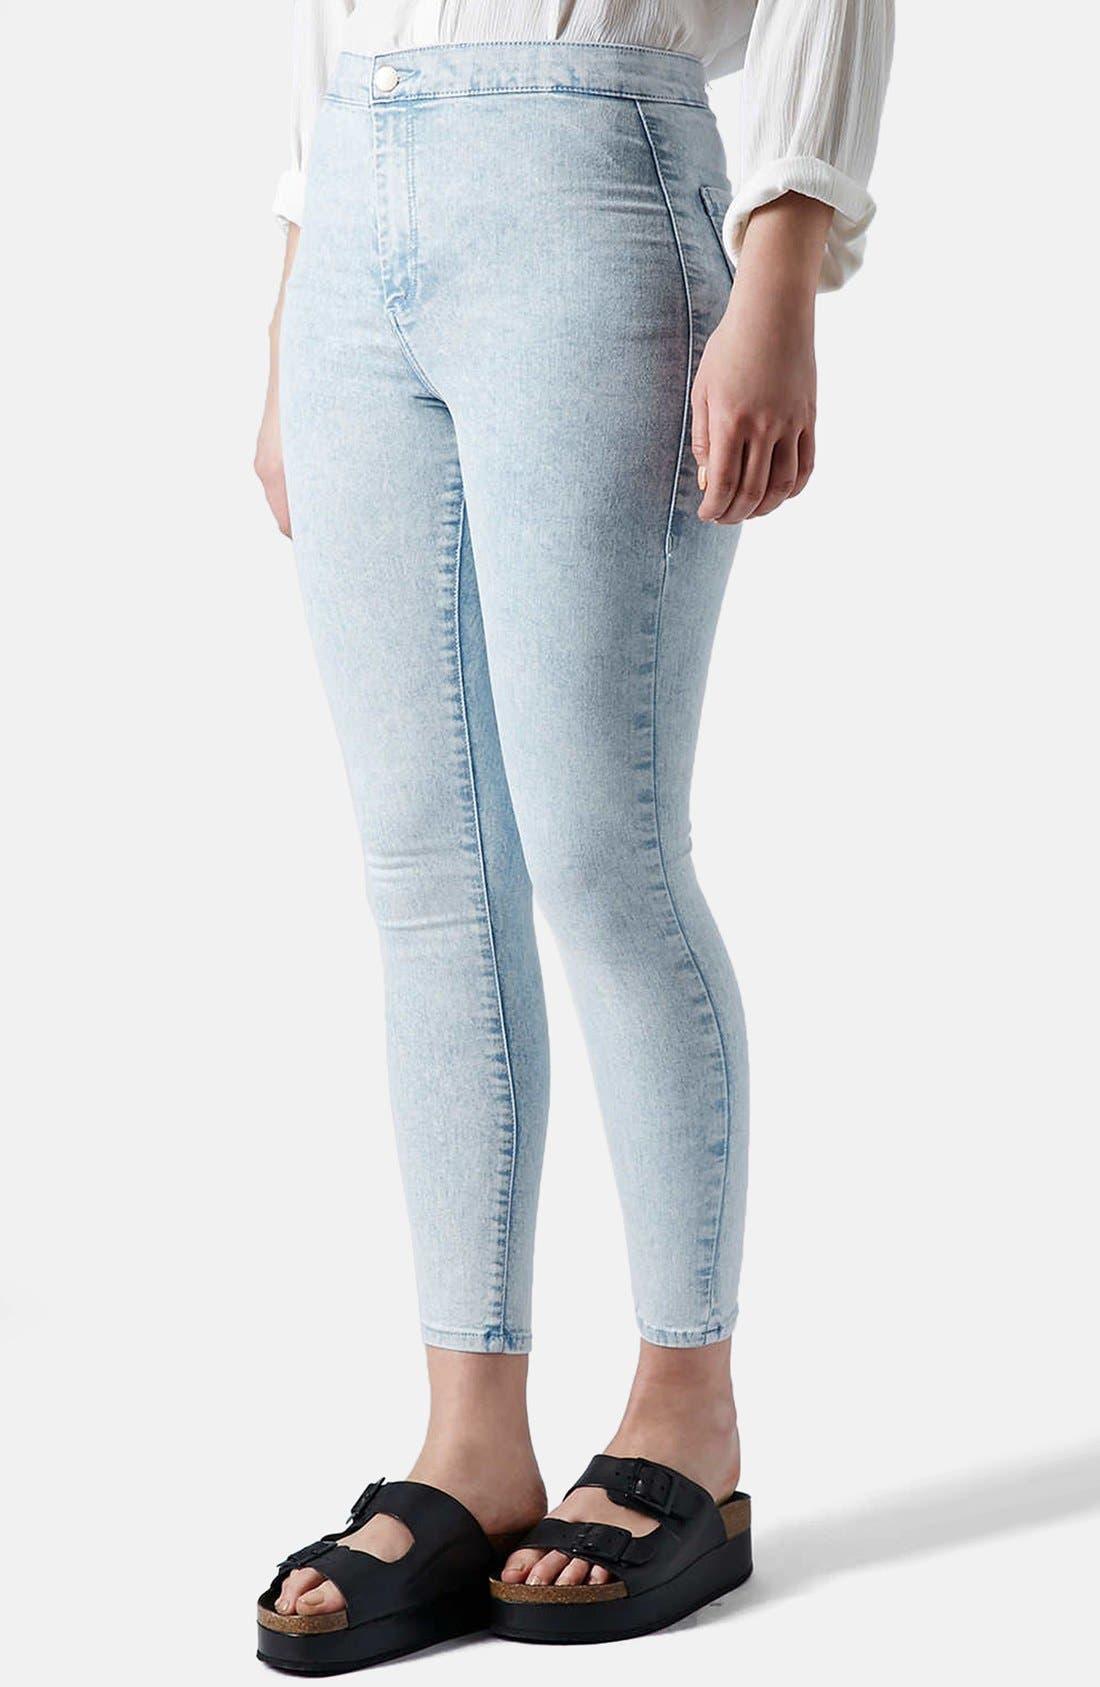 Alternate Image 1 Selected - Topshop 'Joni' Mottled Ultra Skinny Jeans (Bleach Stone)